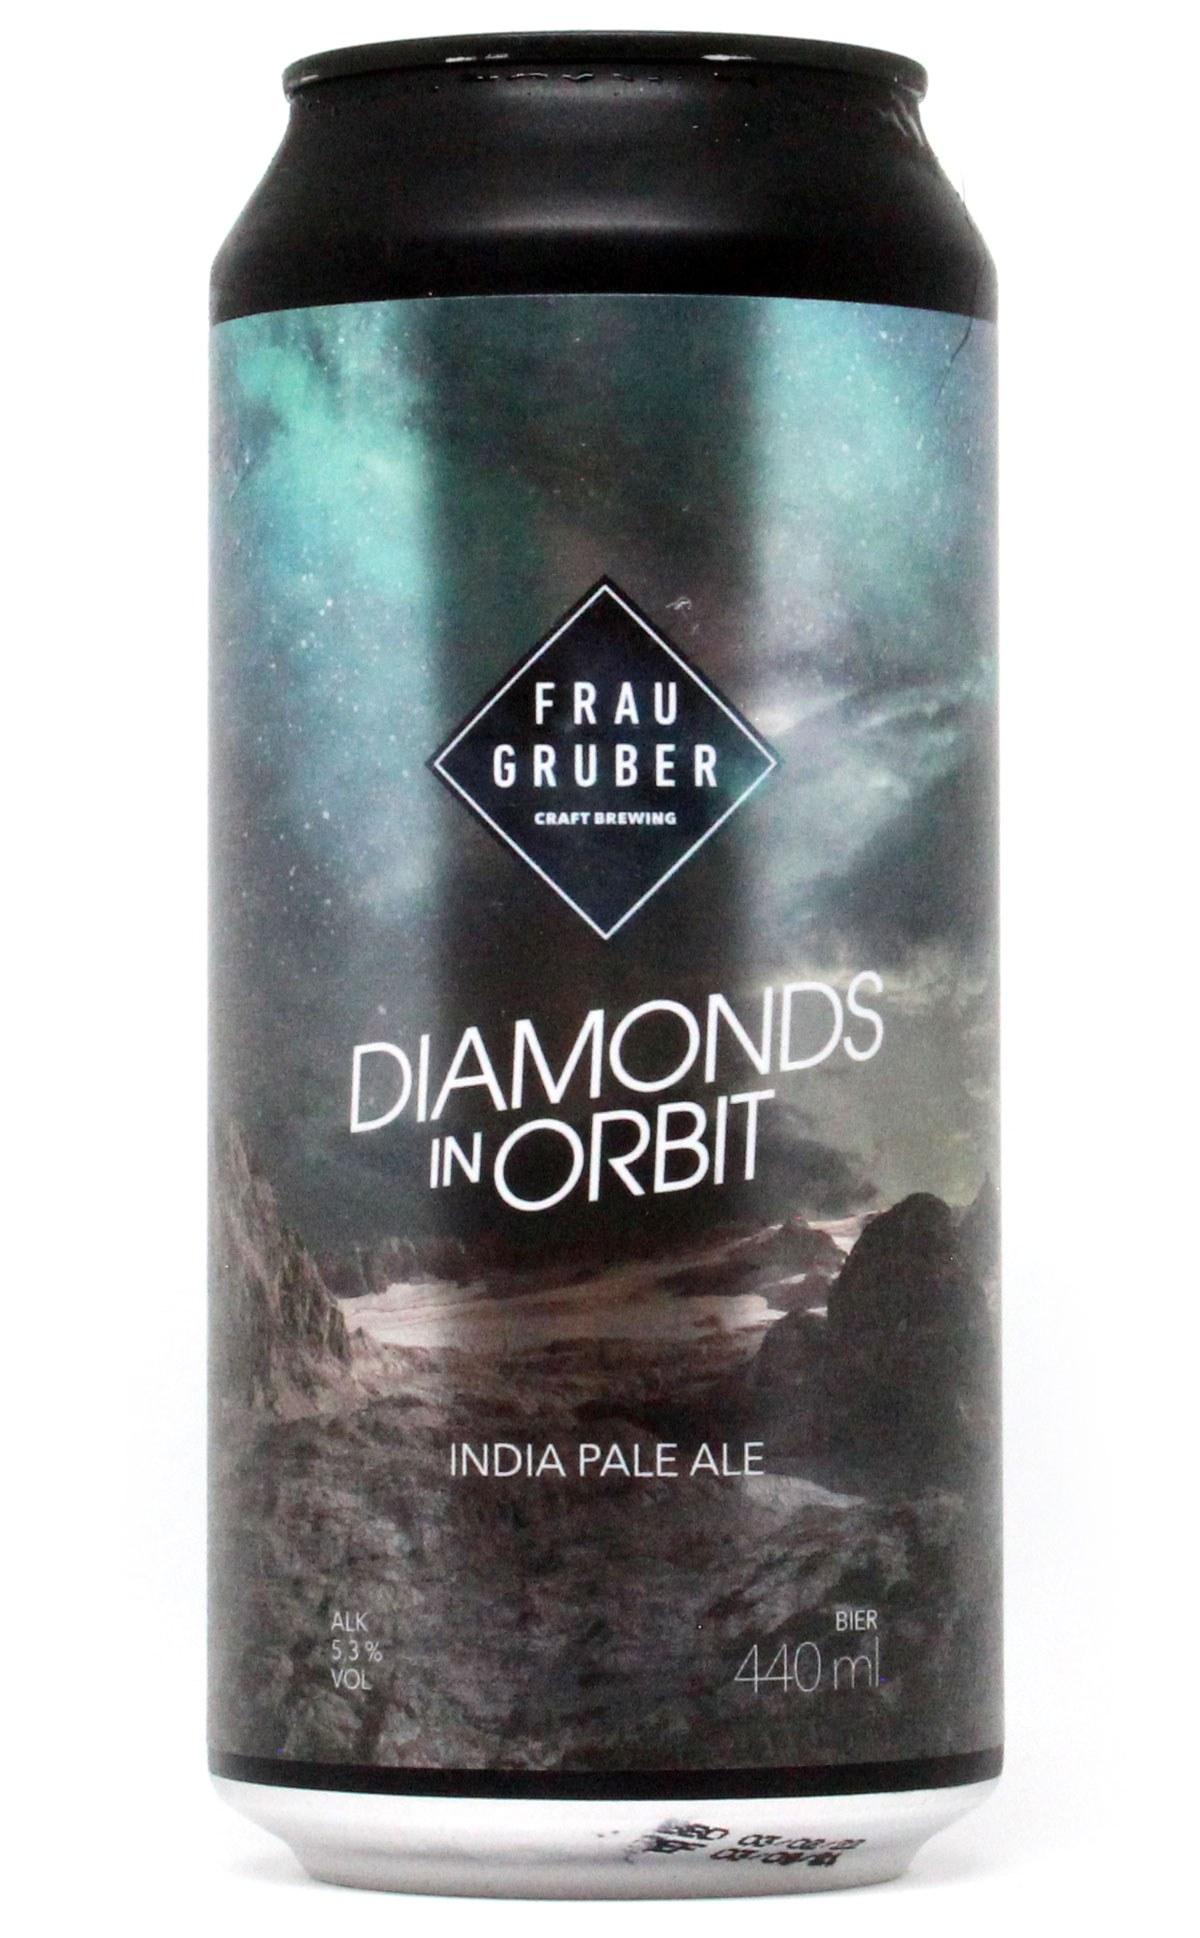 Diamonds in Orbit